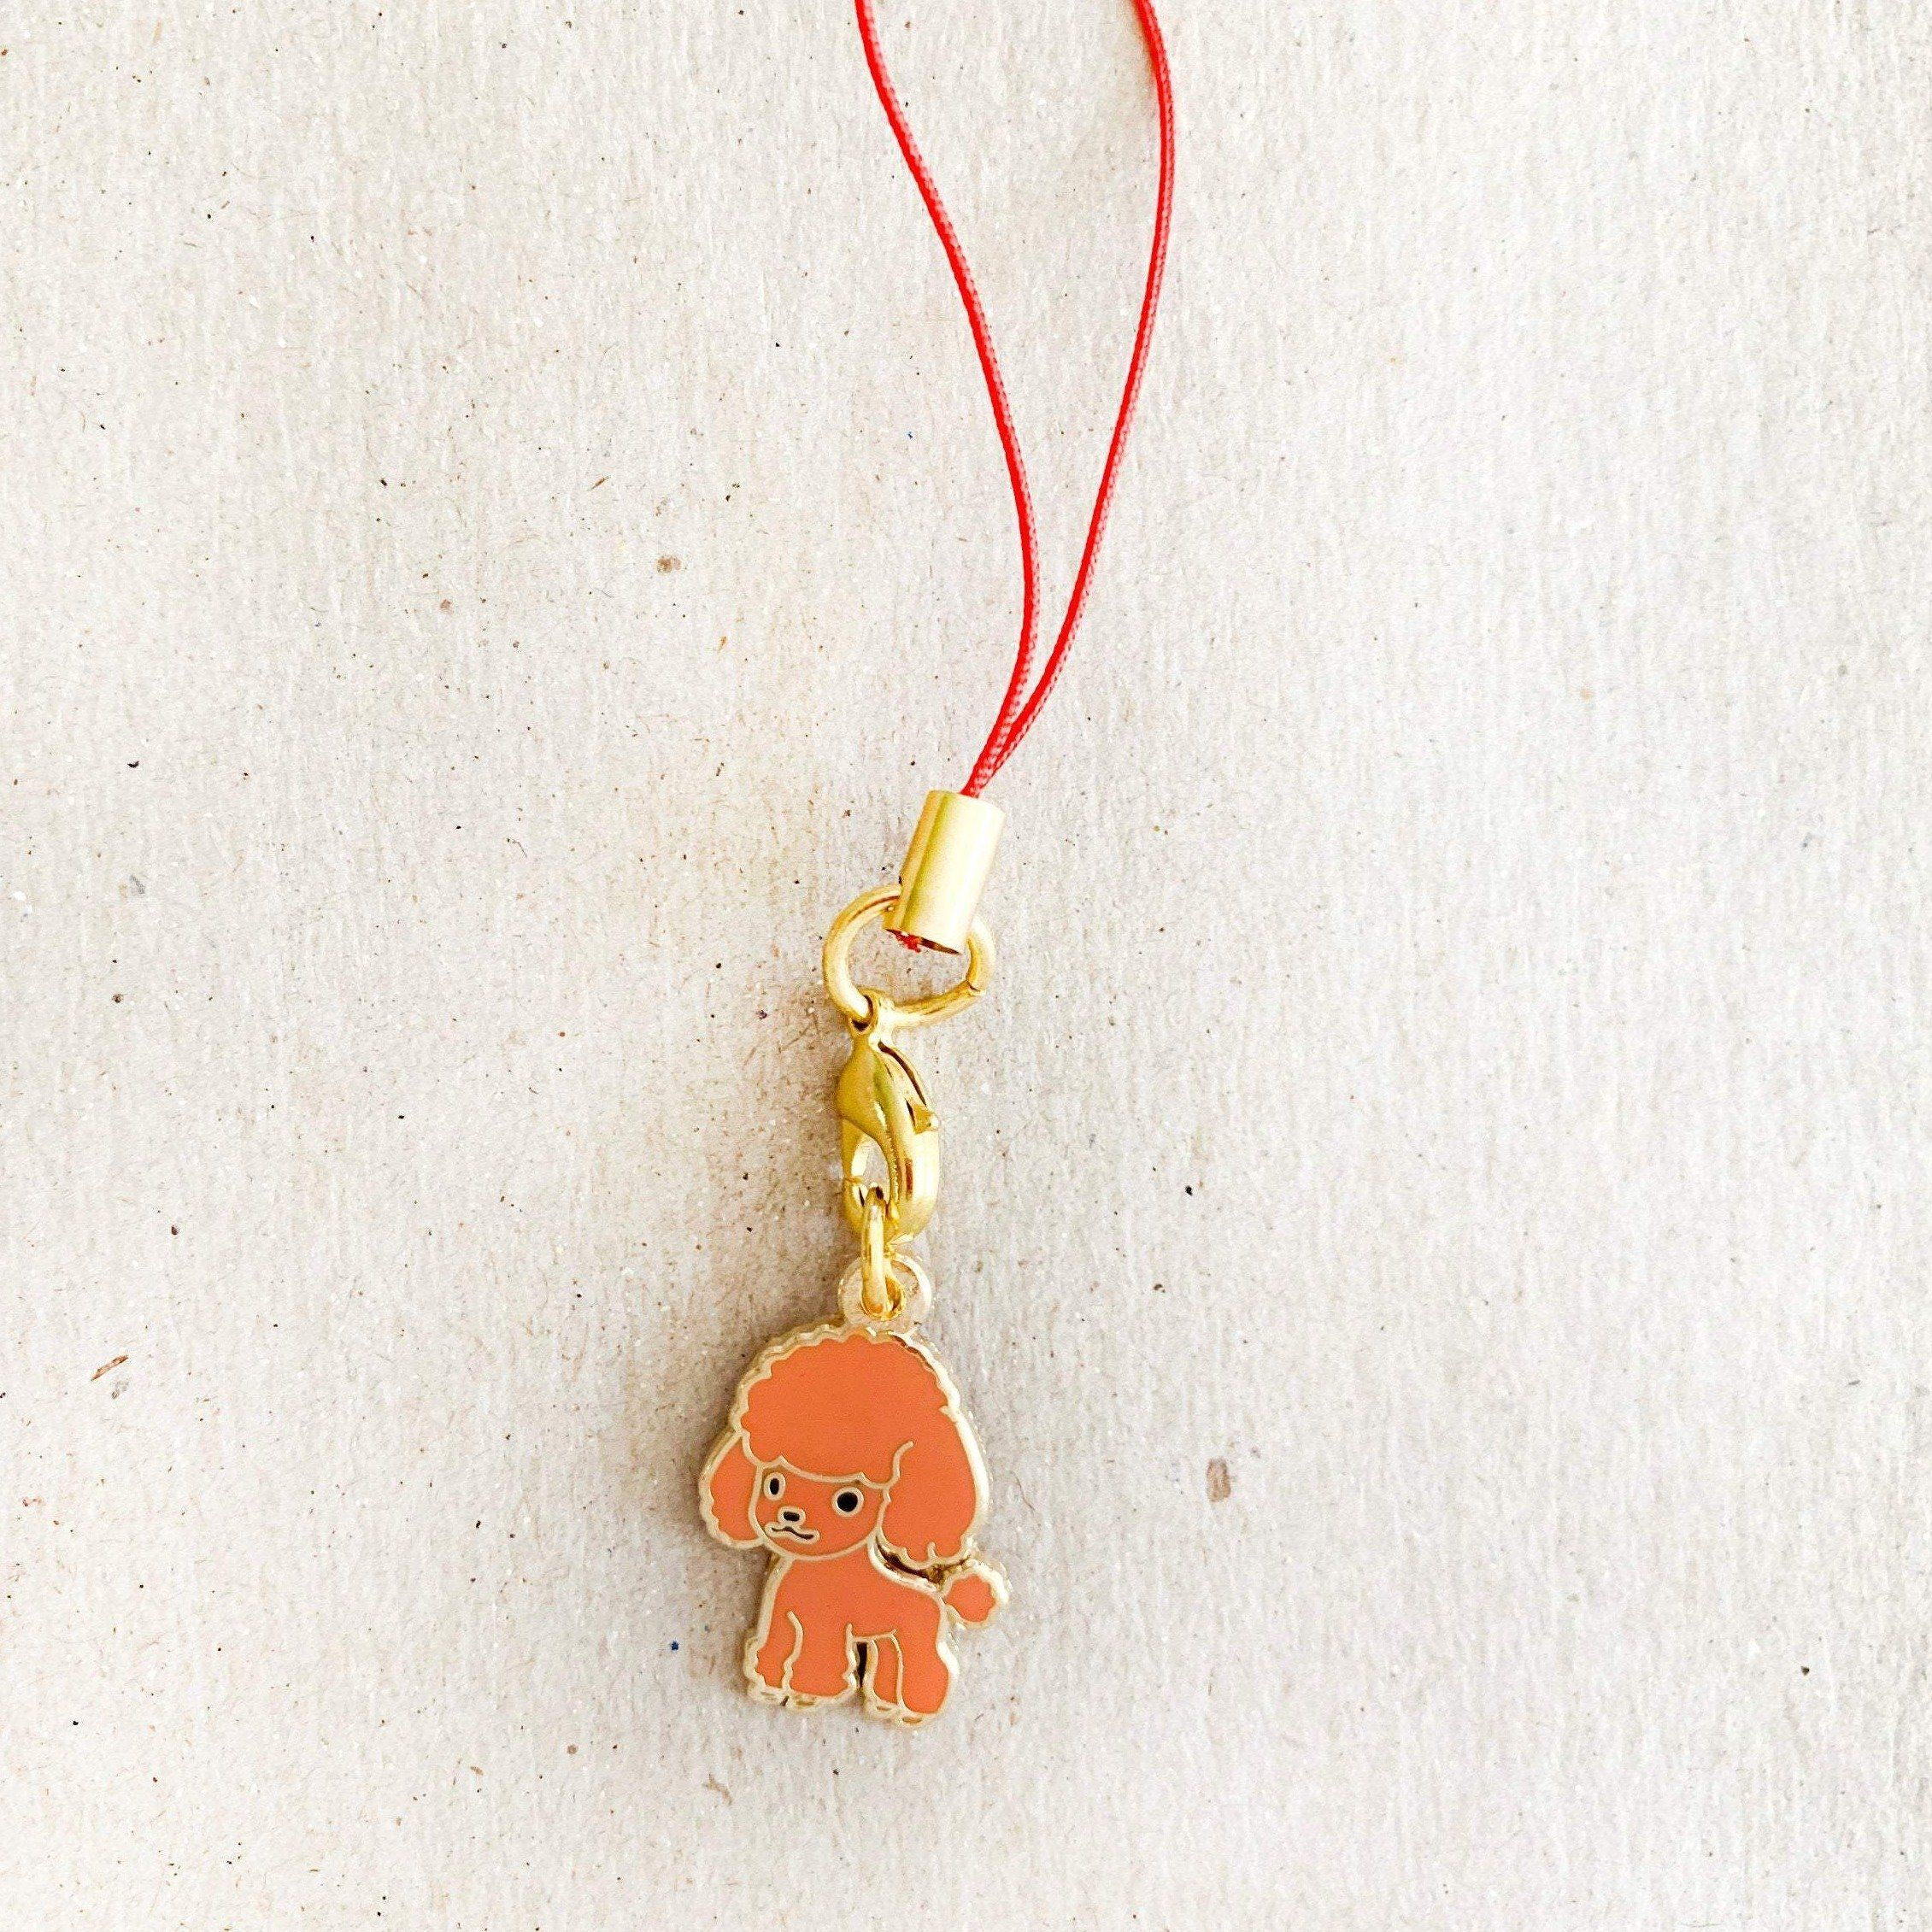 Enamel Charm - Standard Poodle Keychain (Red)